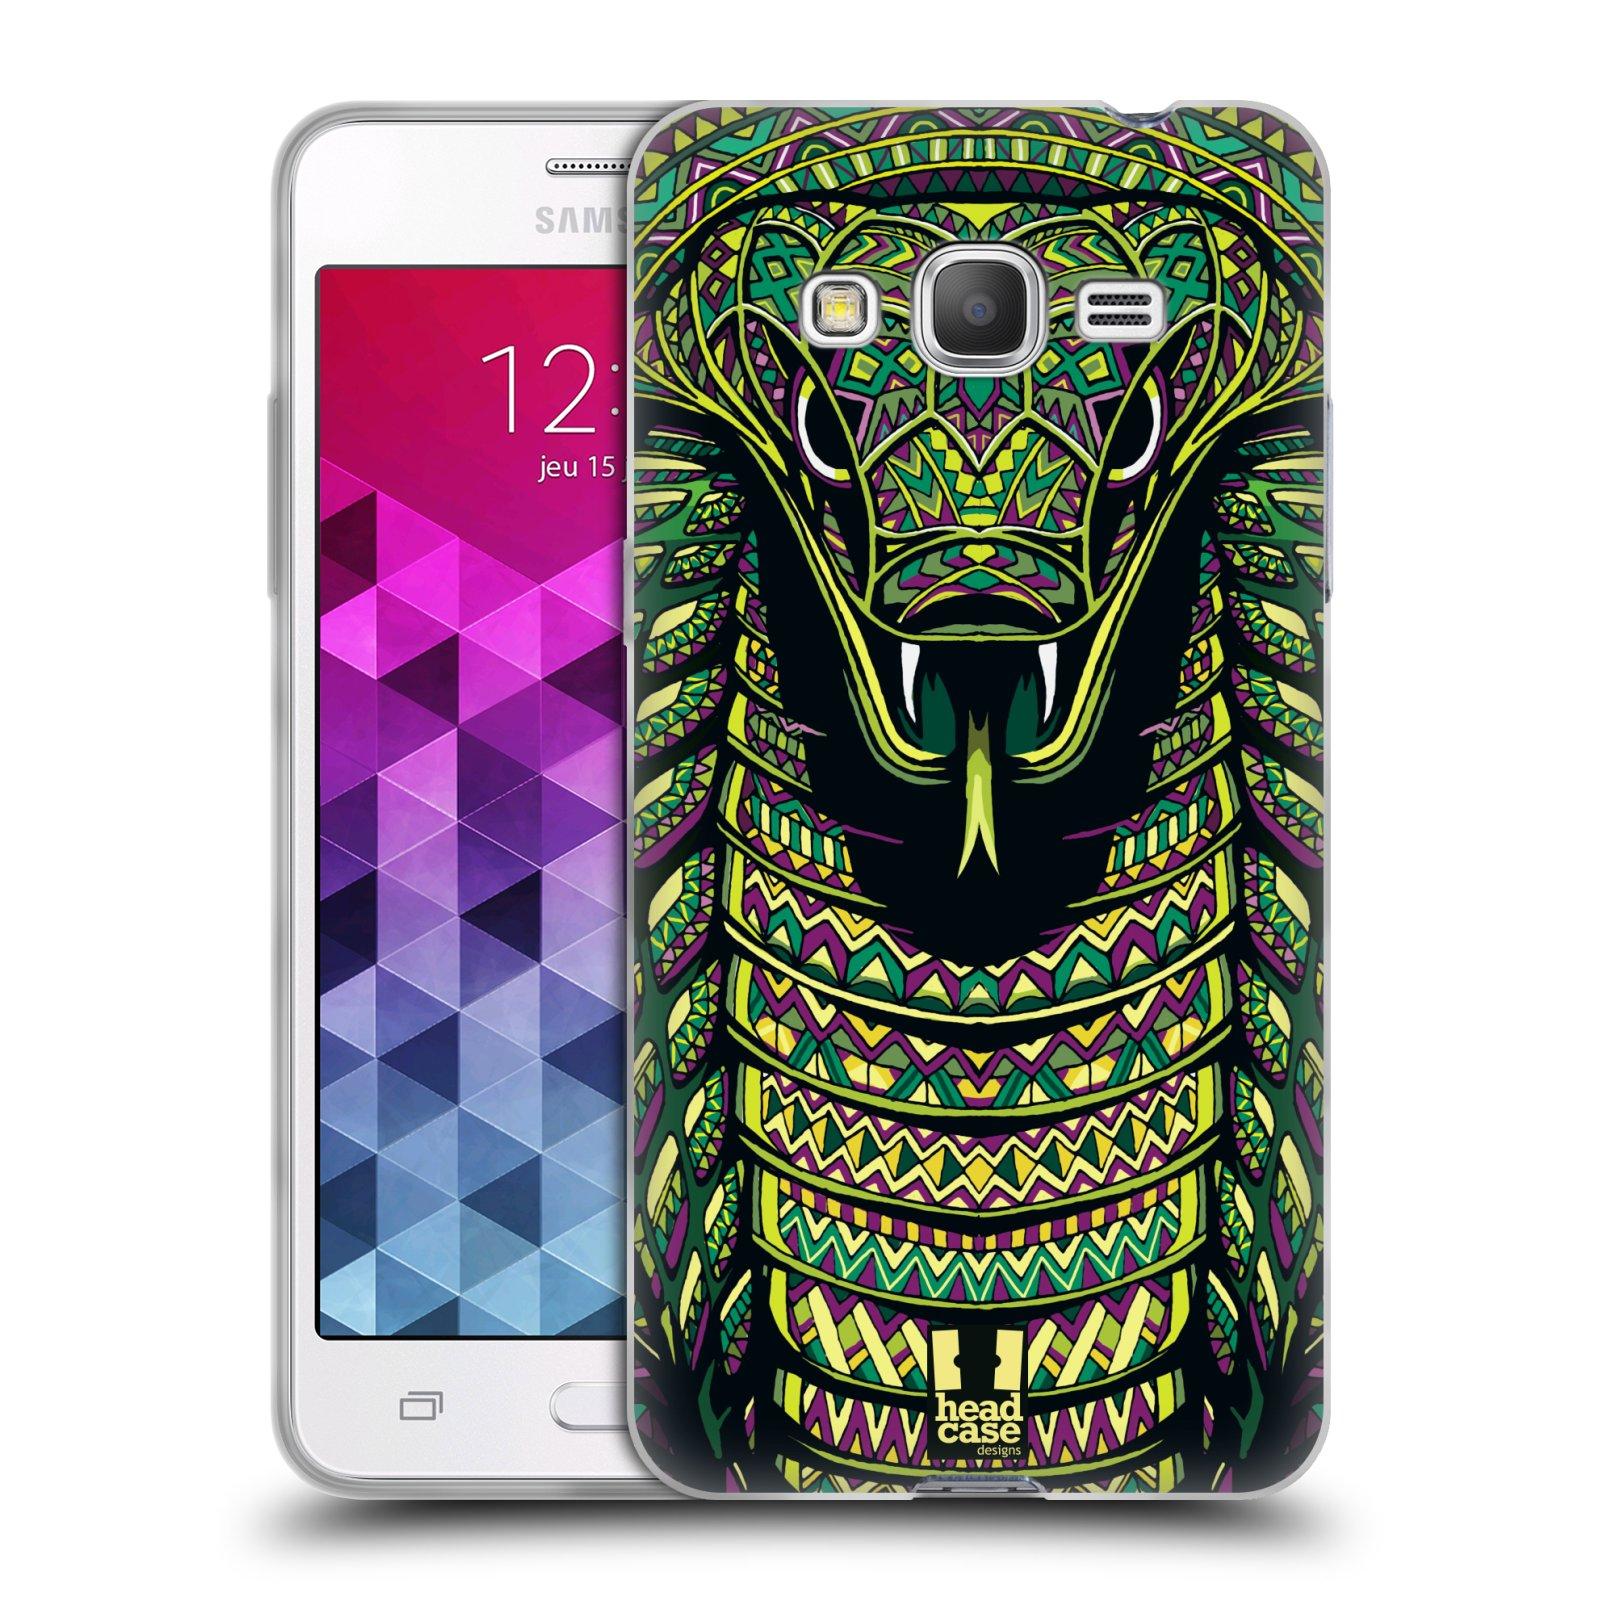 Silikonové pouzdro na mobil Samsung Galaxy Grand Prime HEAD CASE AZTEC HAD